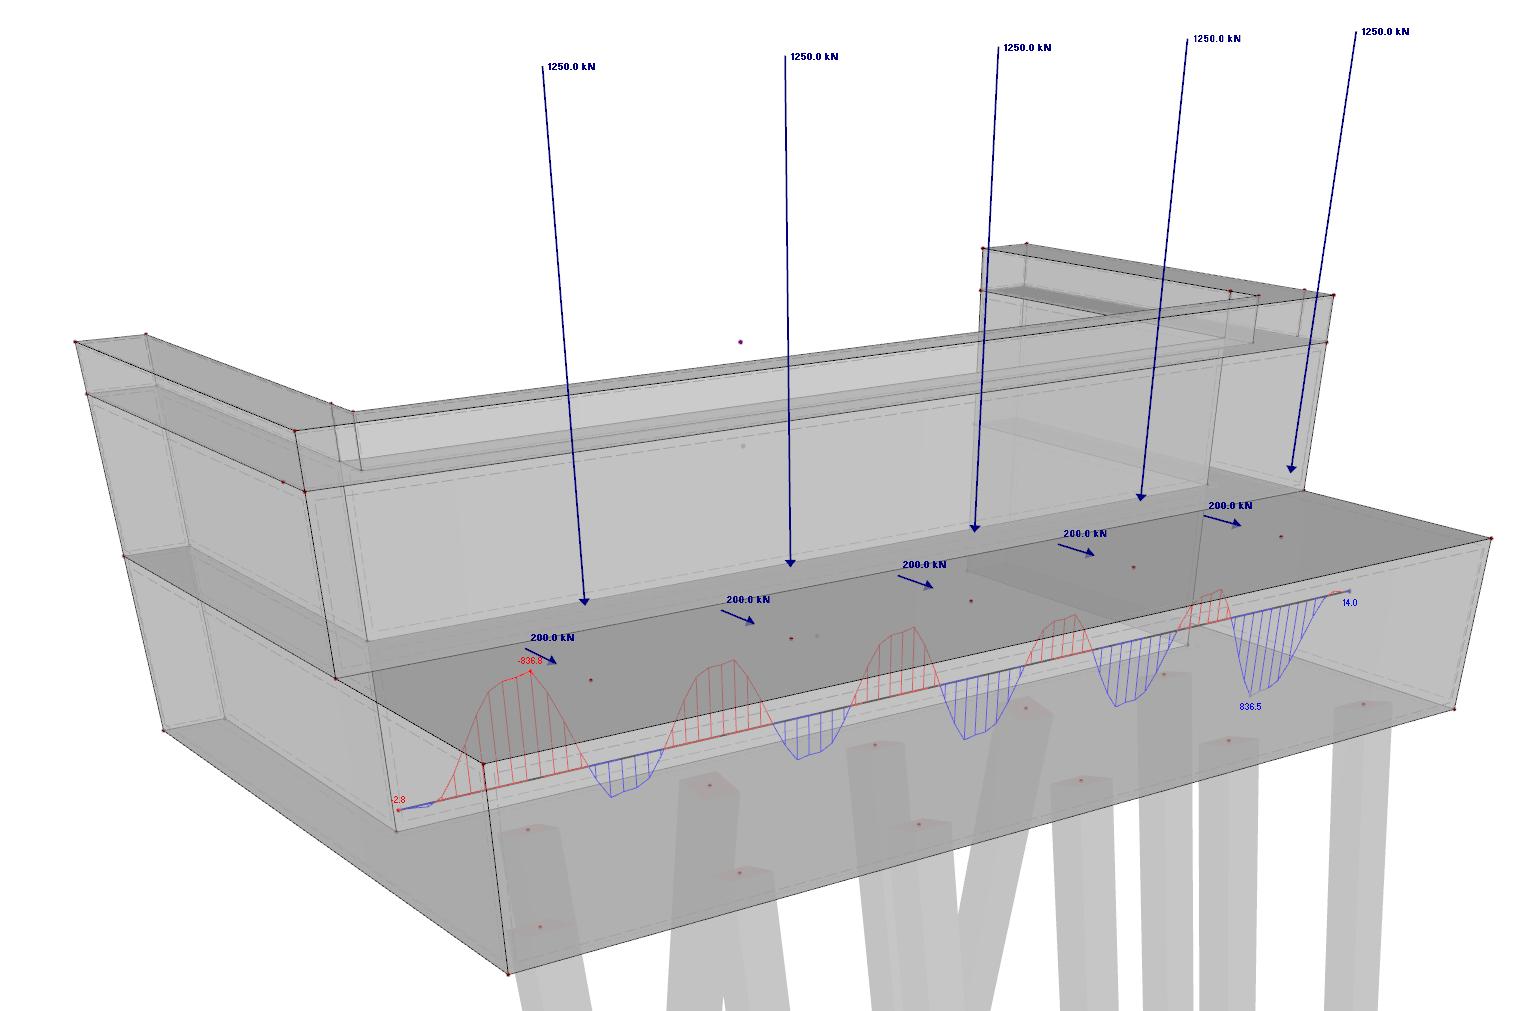 Bridgehead model in RFEm with result beam internal forces import to IDEA BEAM